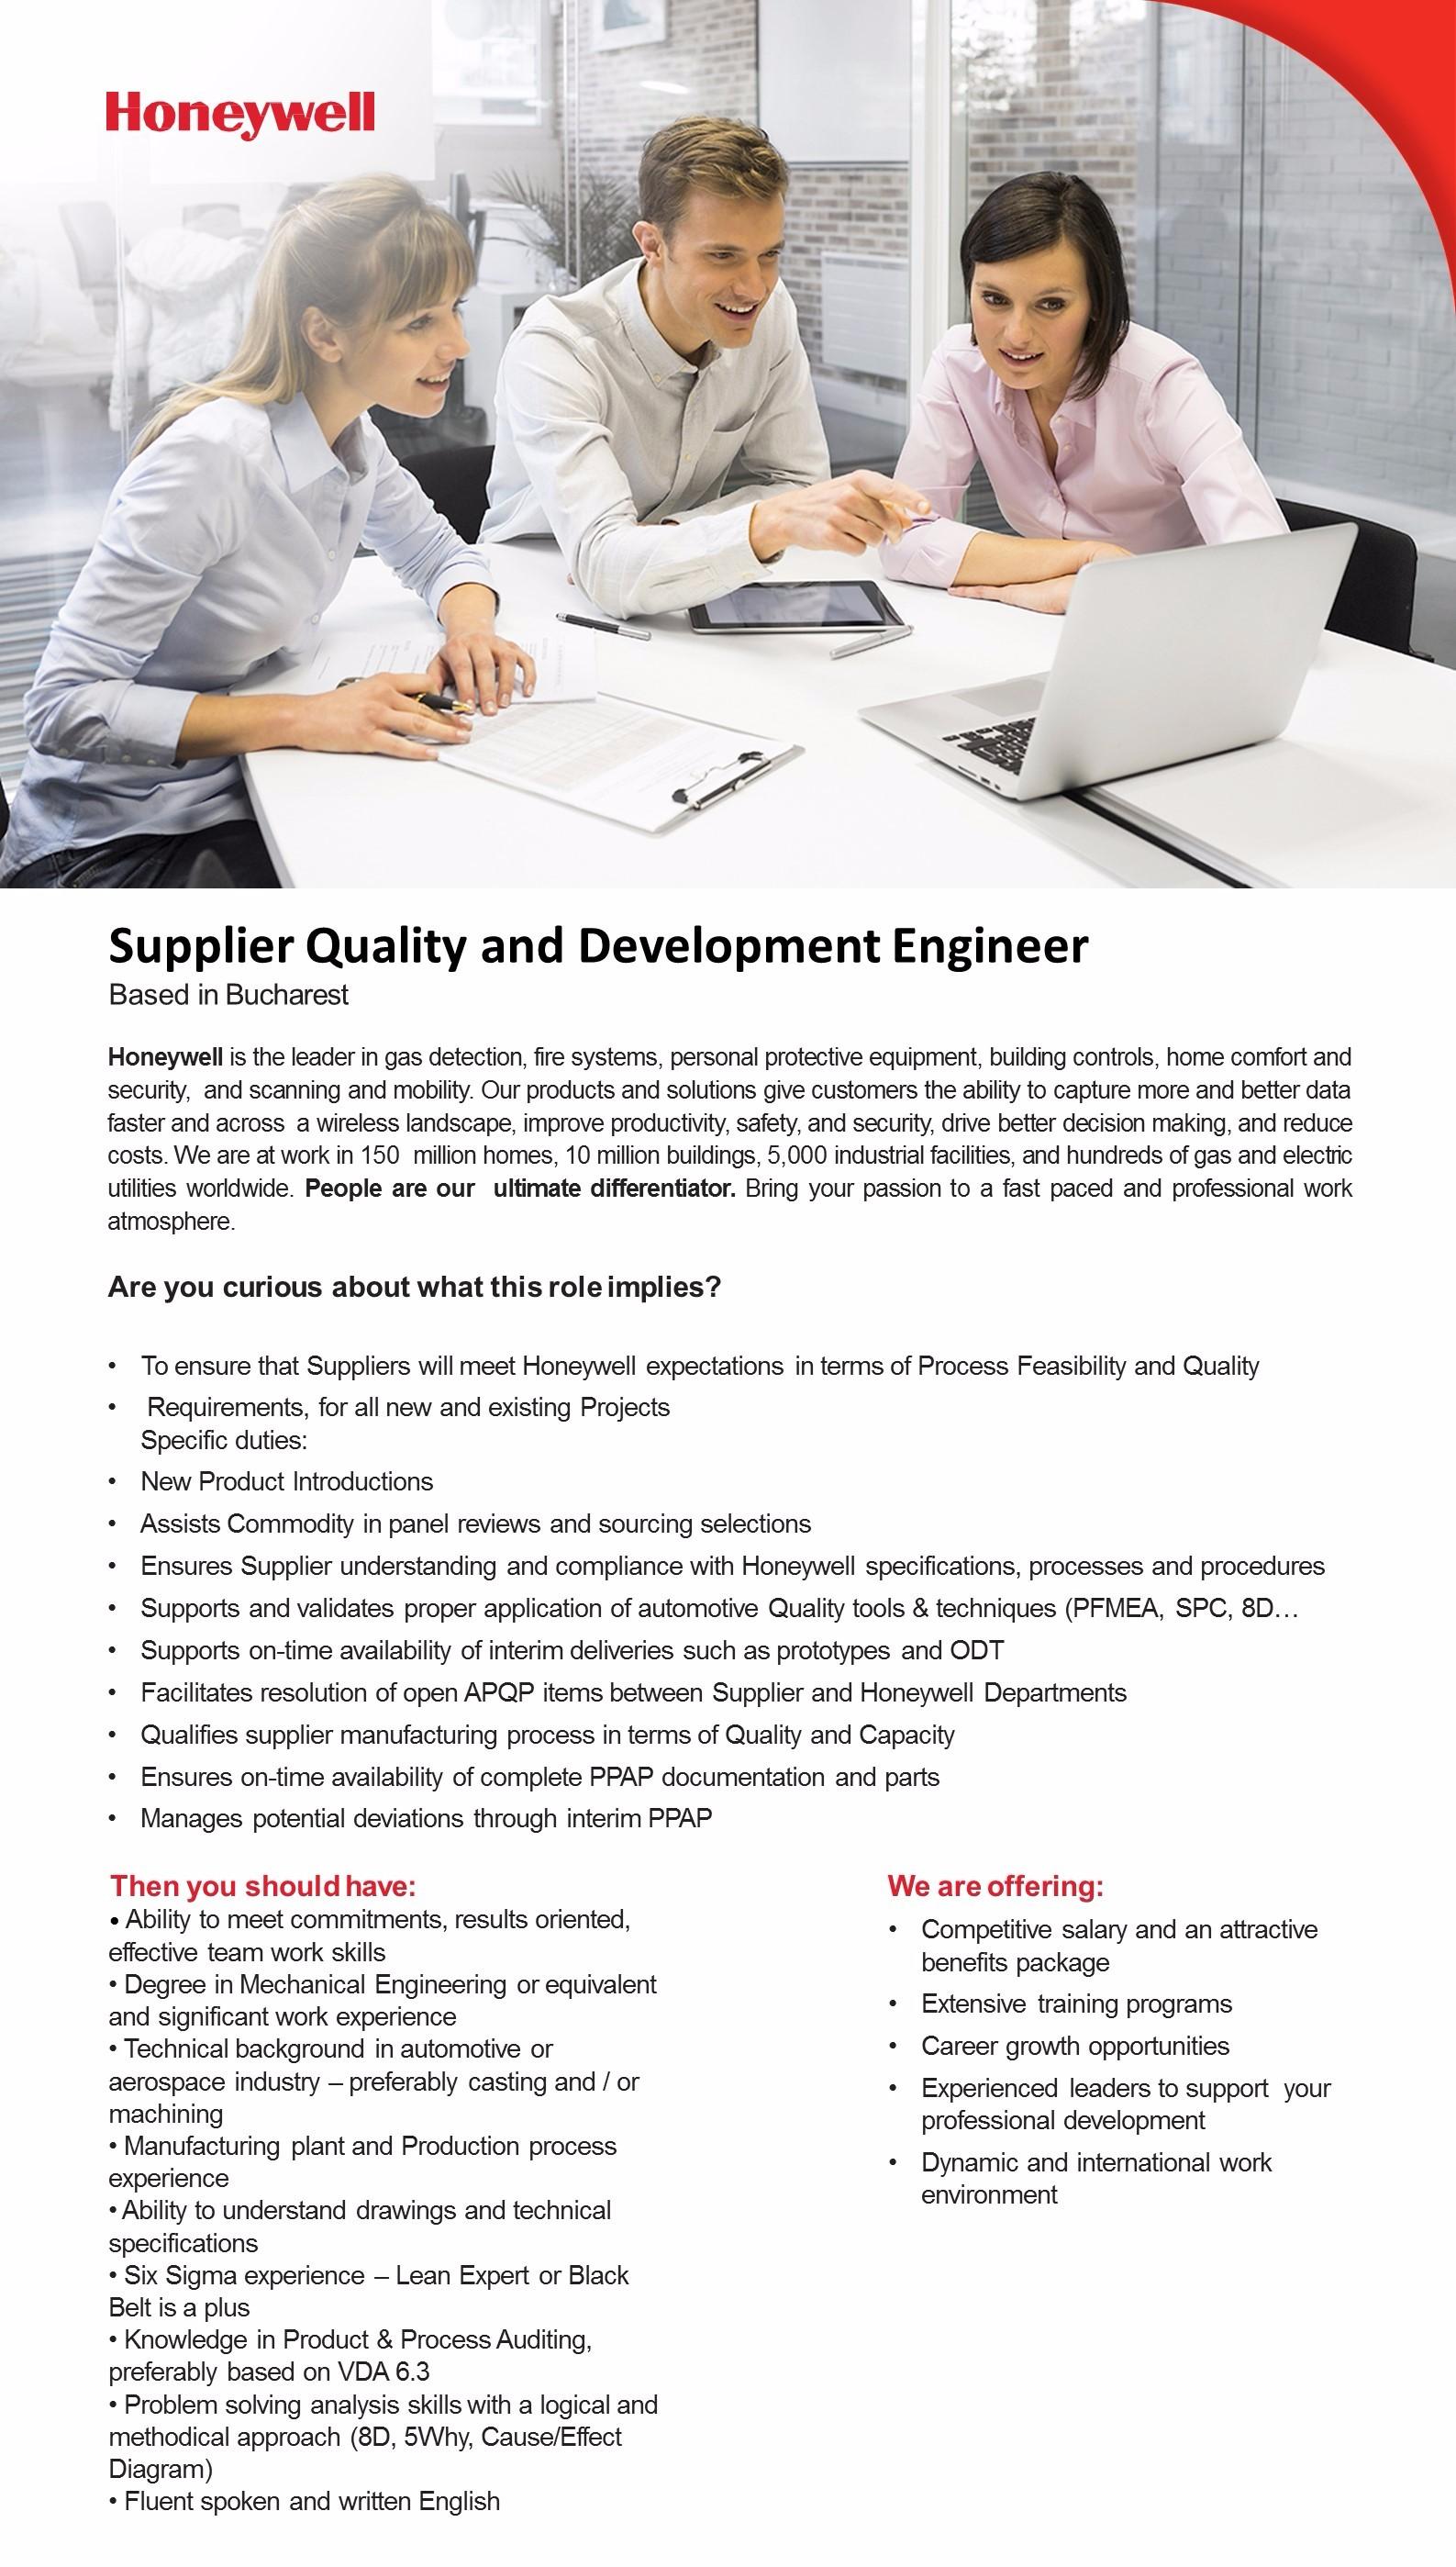 supp q and development